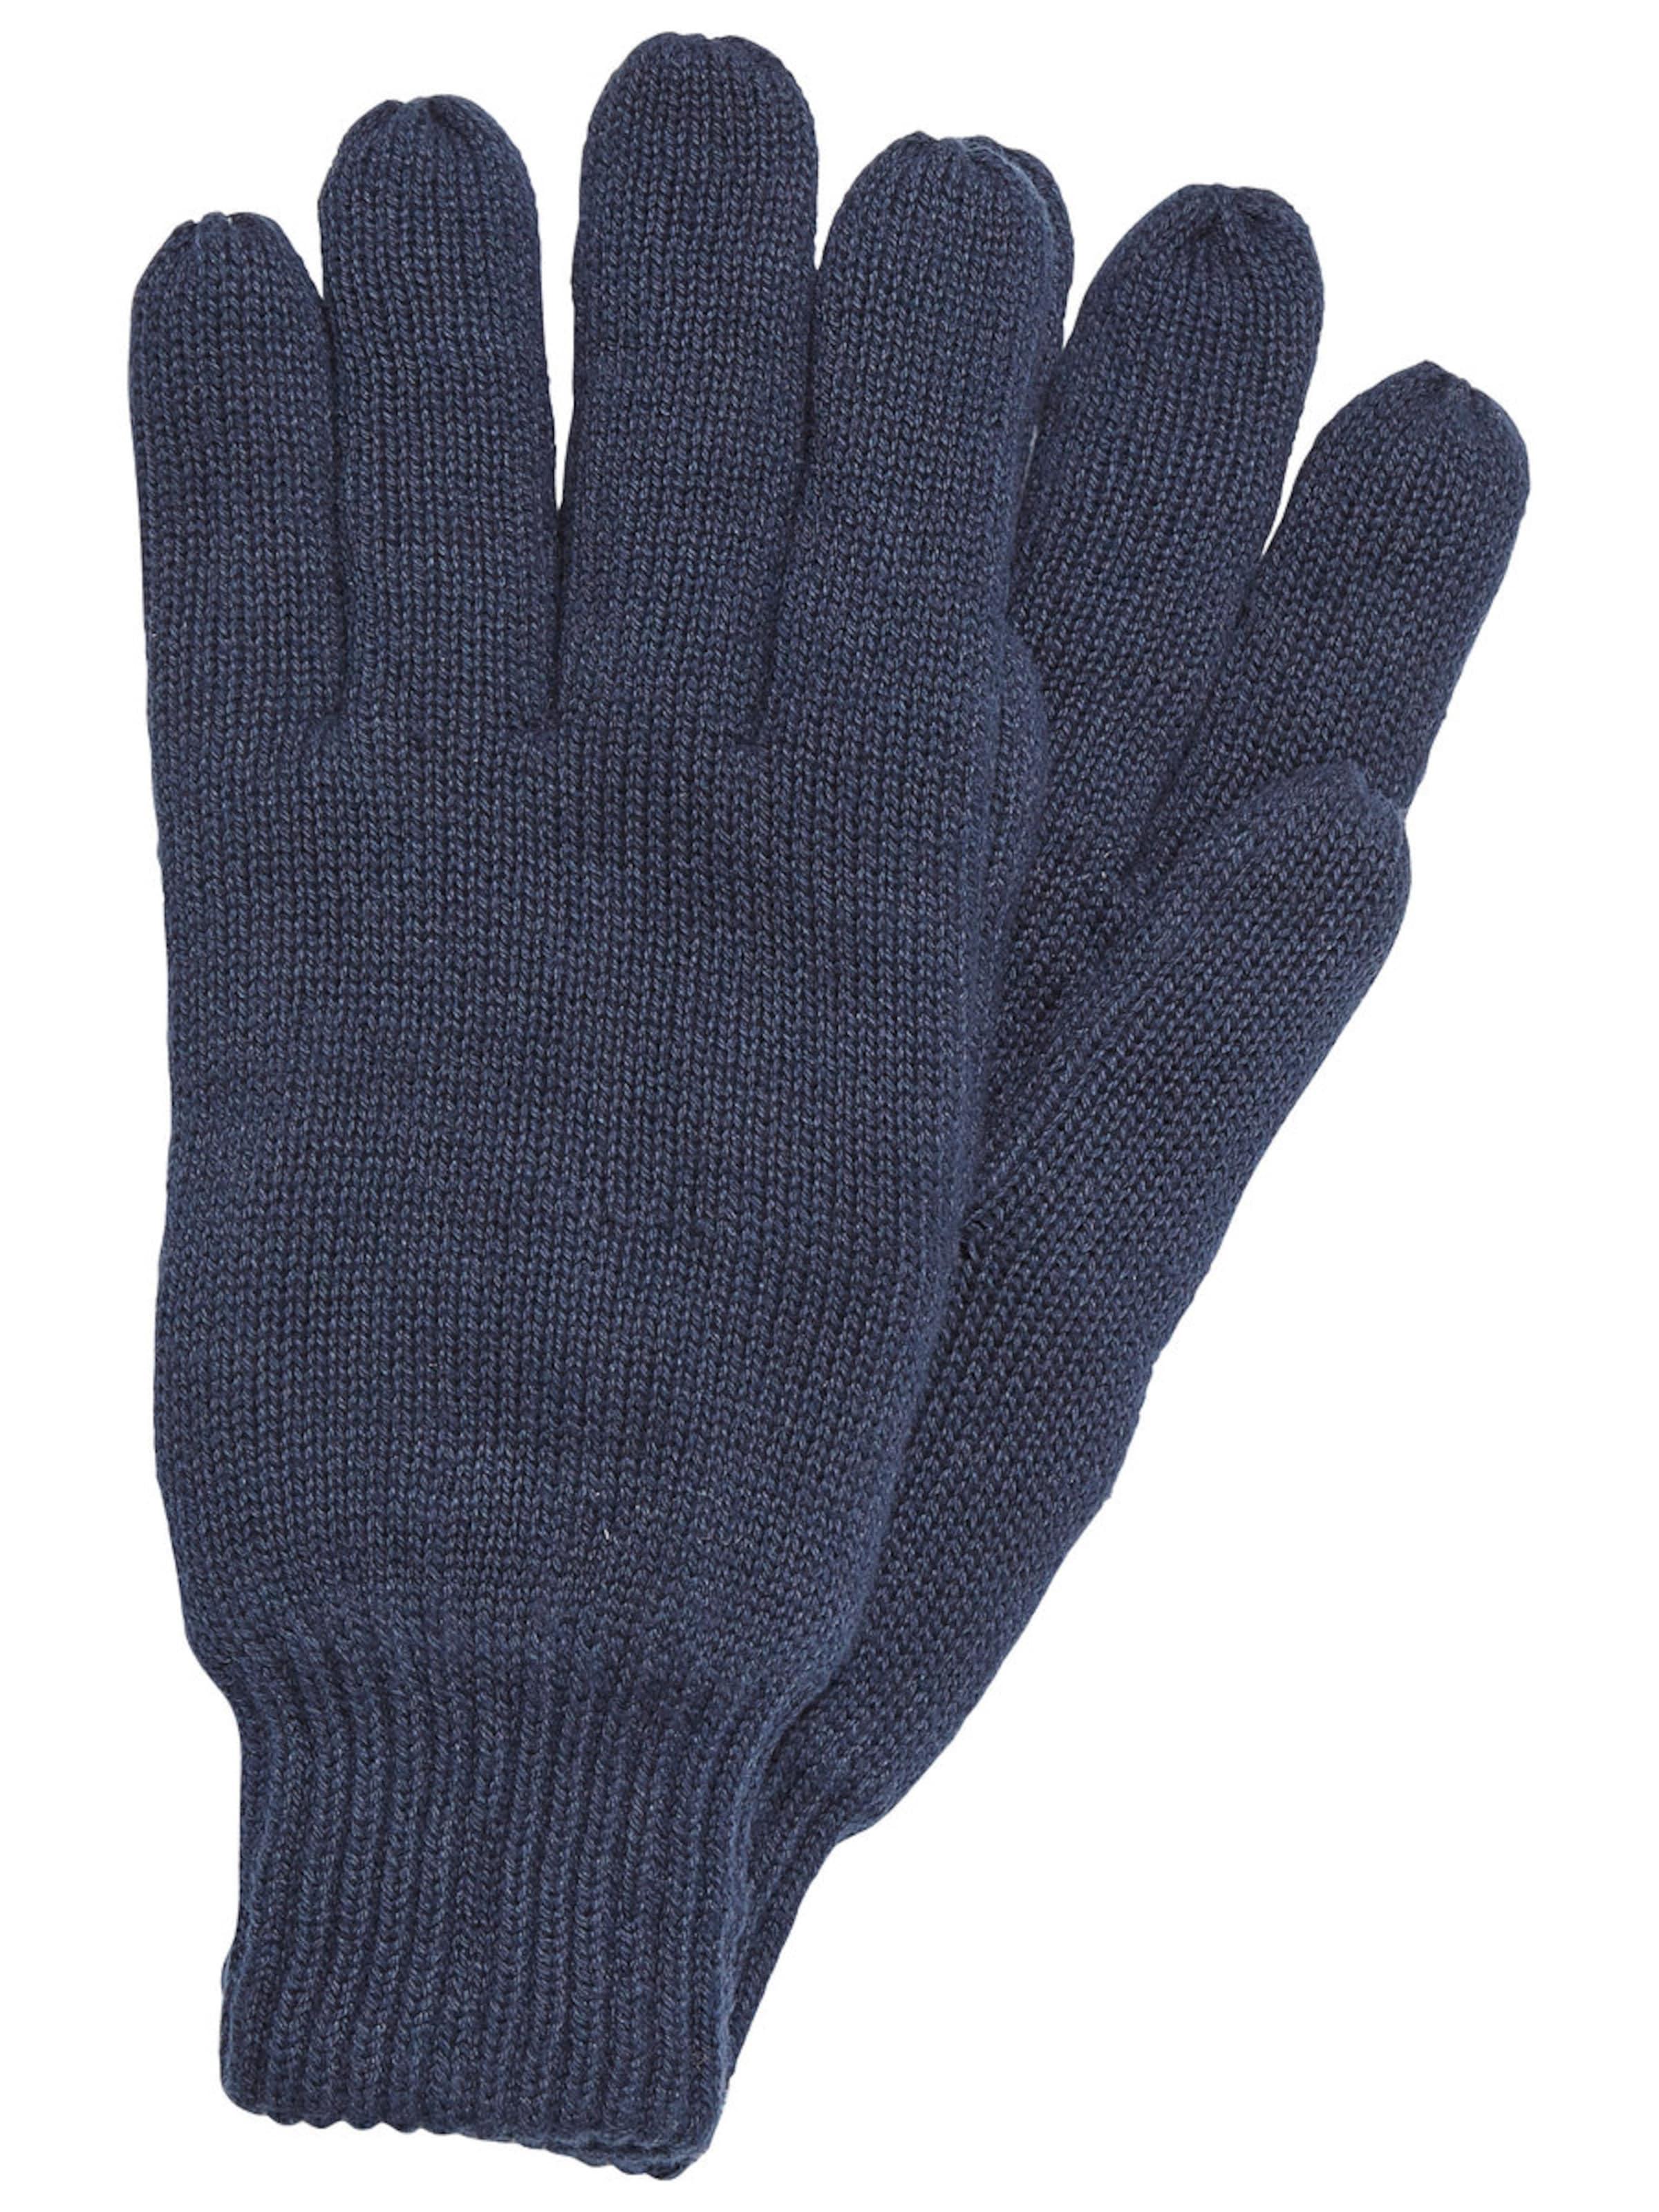 In Deutschland Online Billig Verkauf Besuch SELECTED HOMME Handschuhe bloFpn